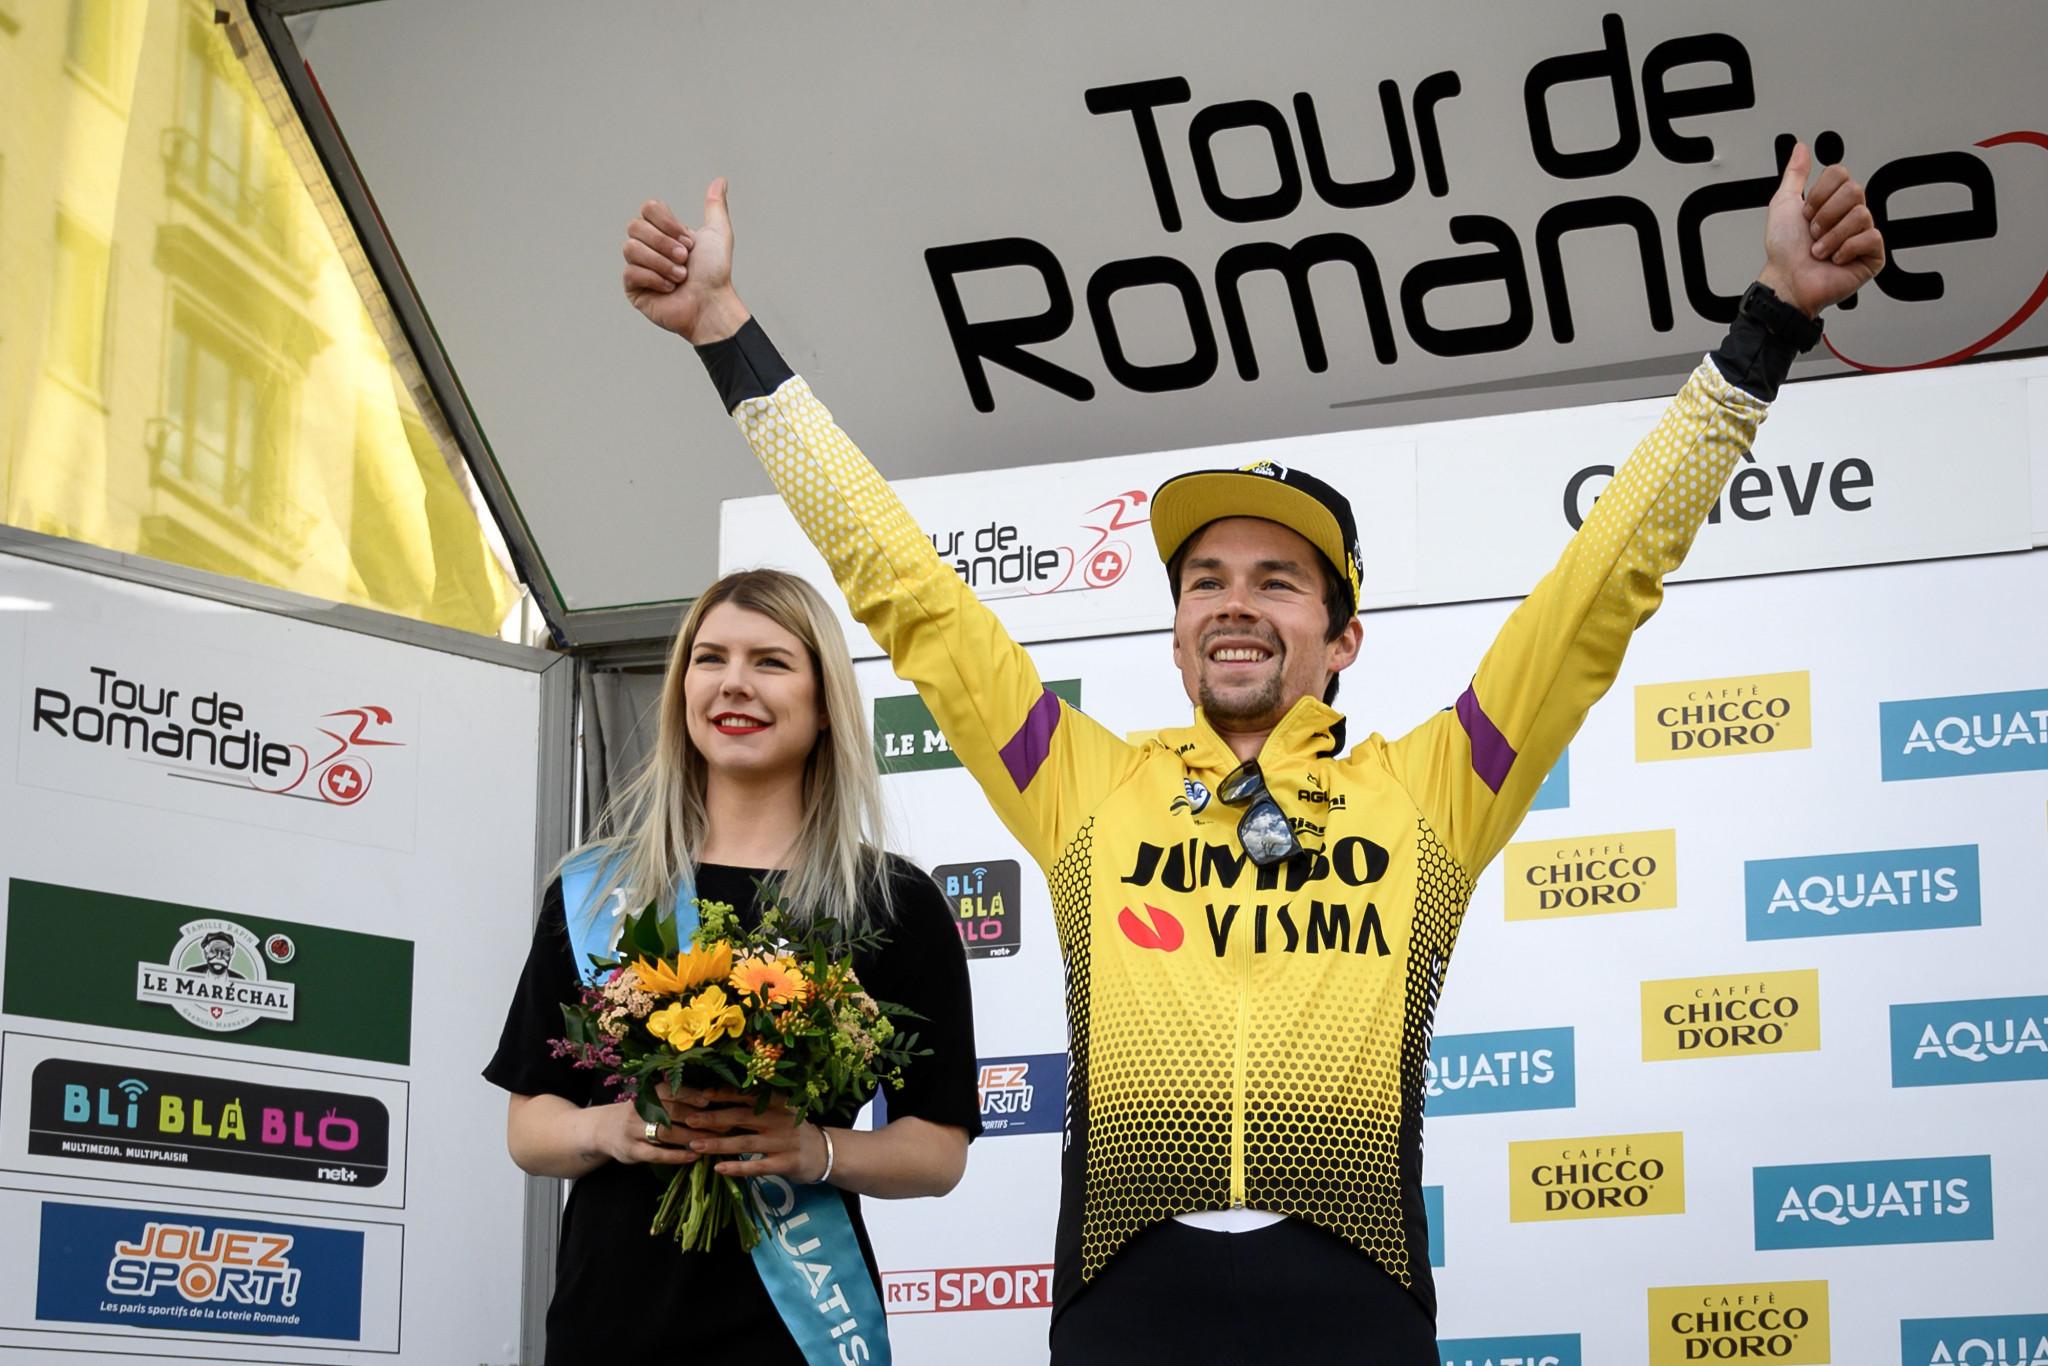 Slovenia's Primož Roglič sealed a second successive overall victory at the Tour de Romandie ©Getty Images